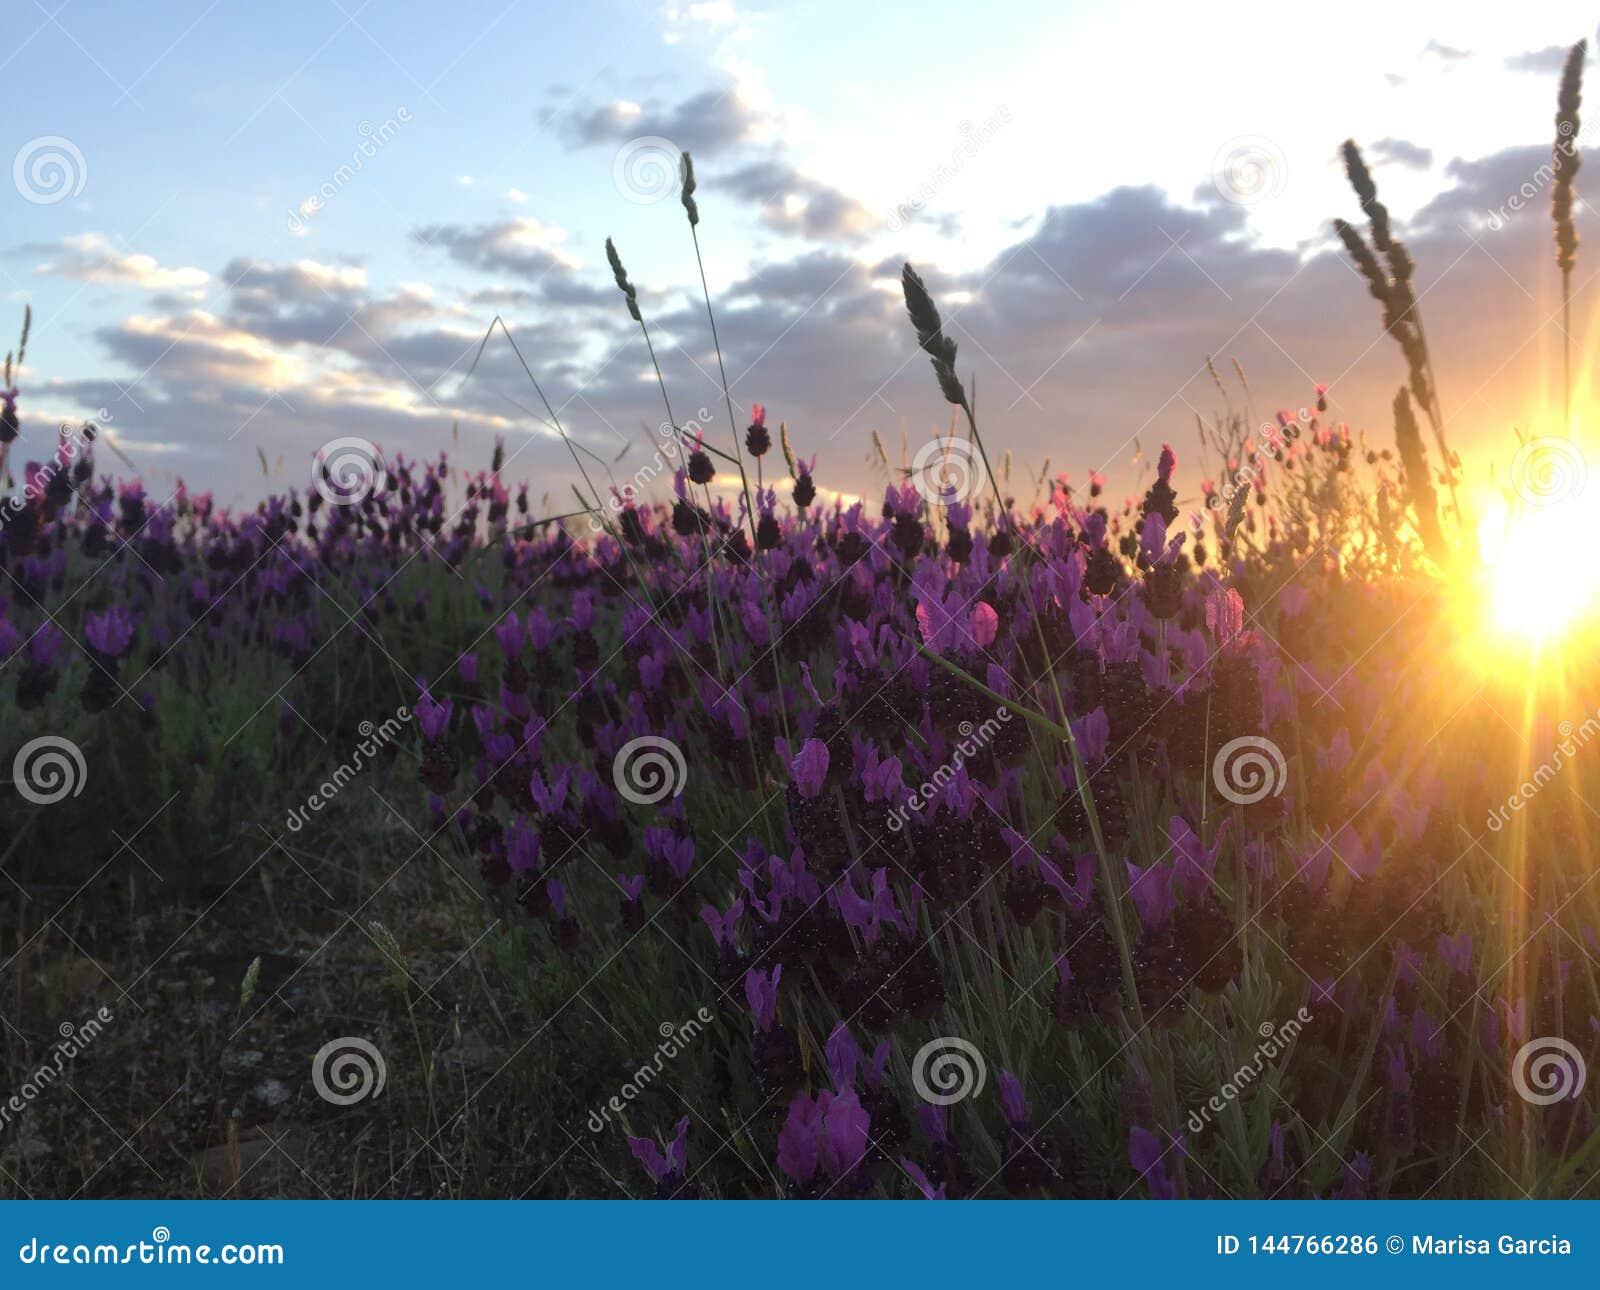 Sonnenunterganglavendelfeld